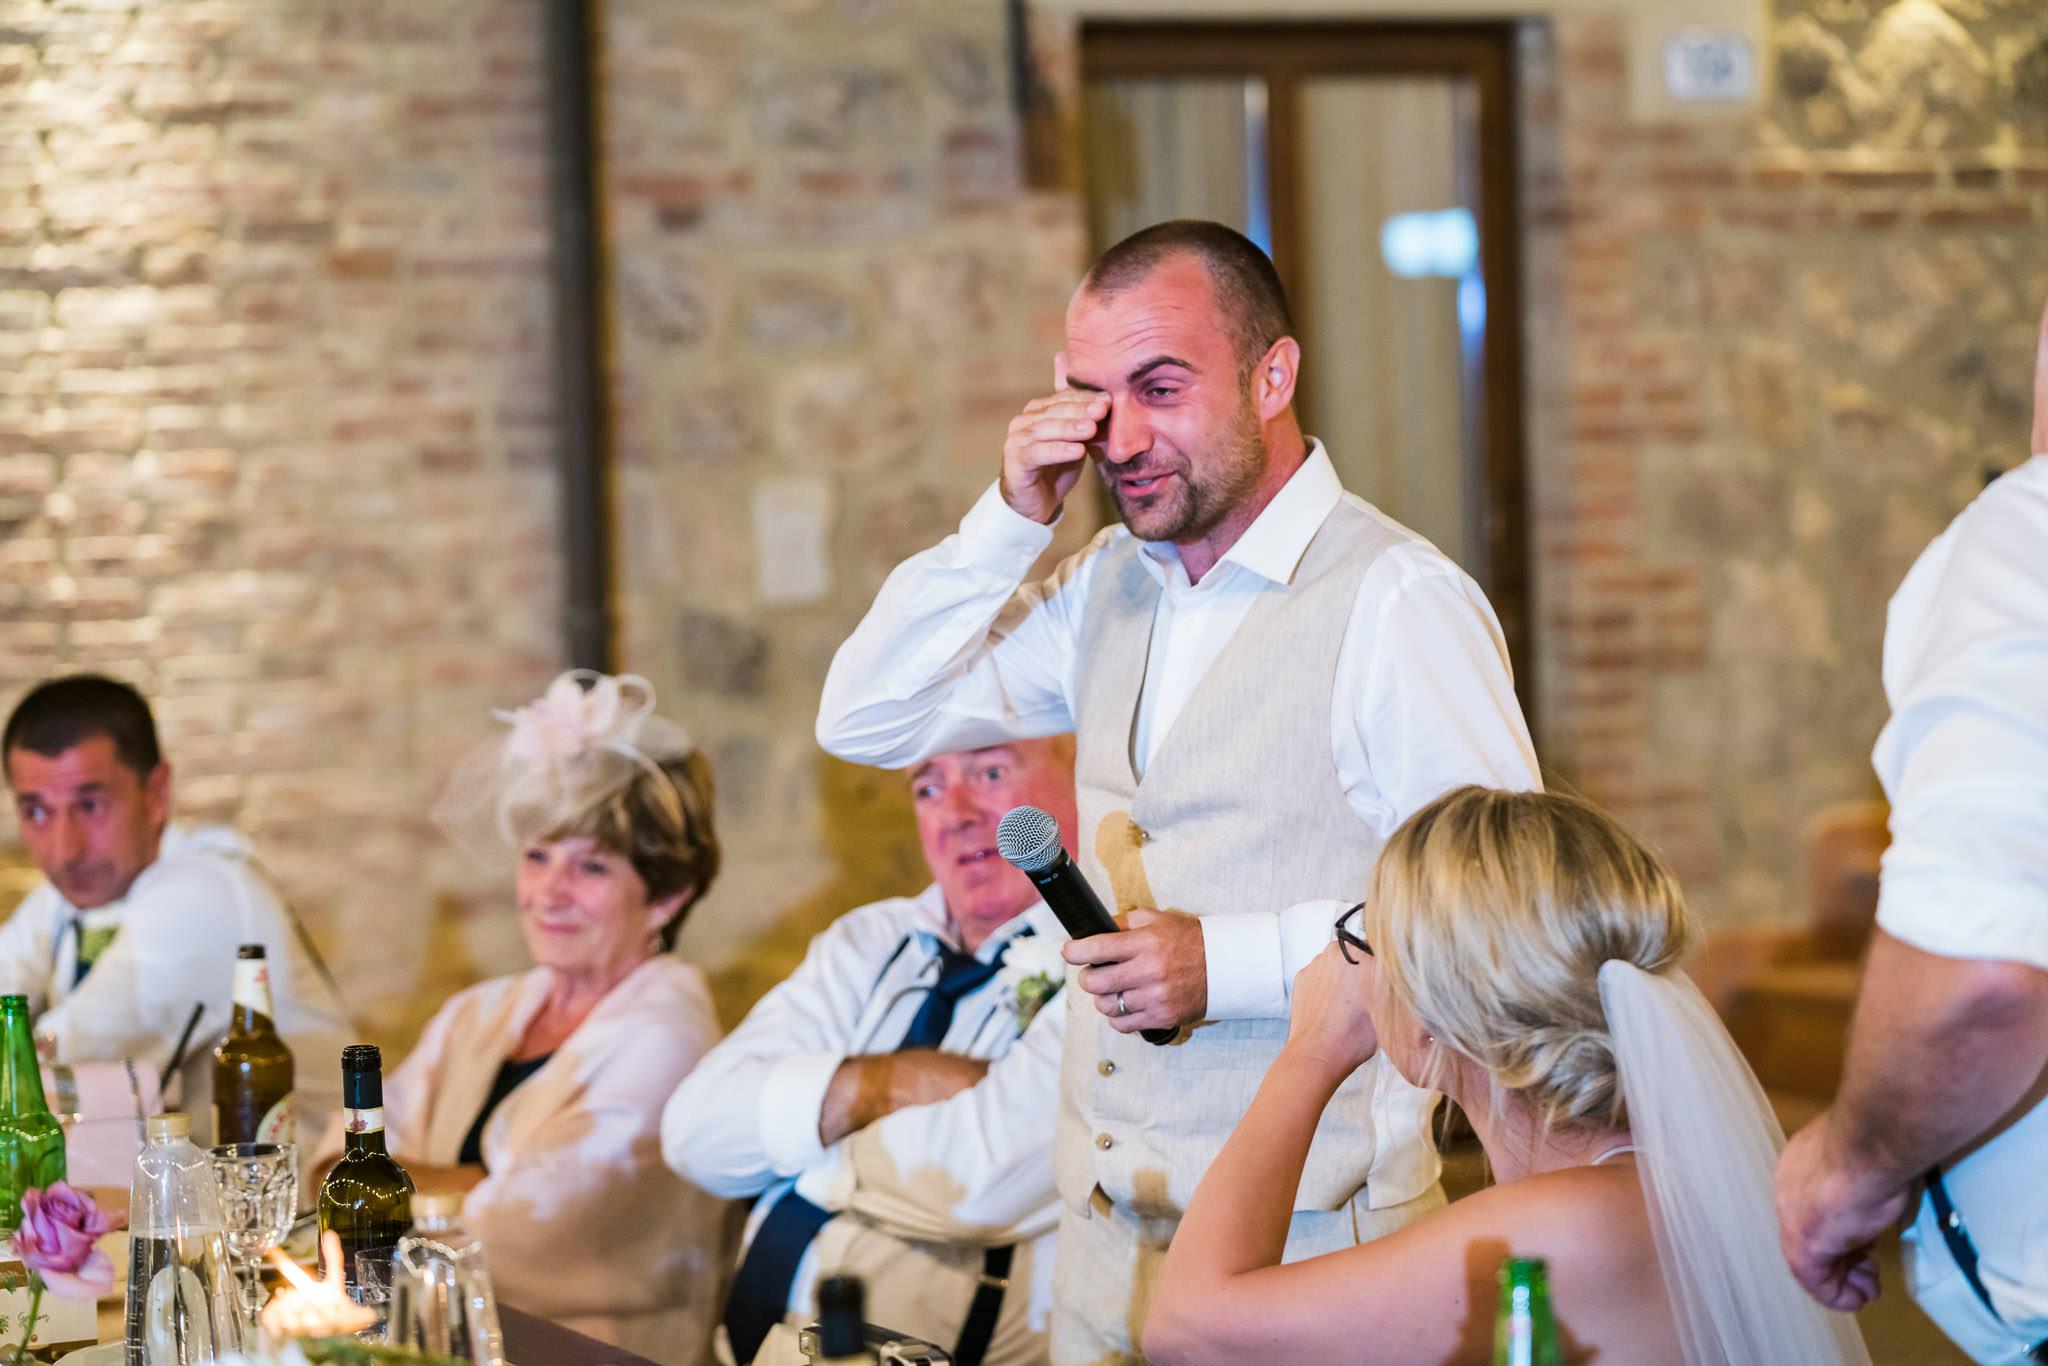 NC-2018-09-07_gemma-and-steve-wedding-2332.jpg